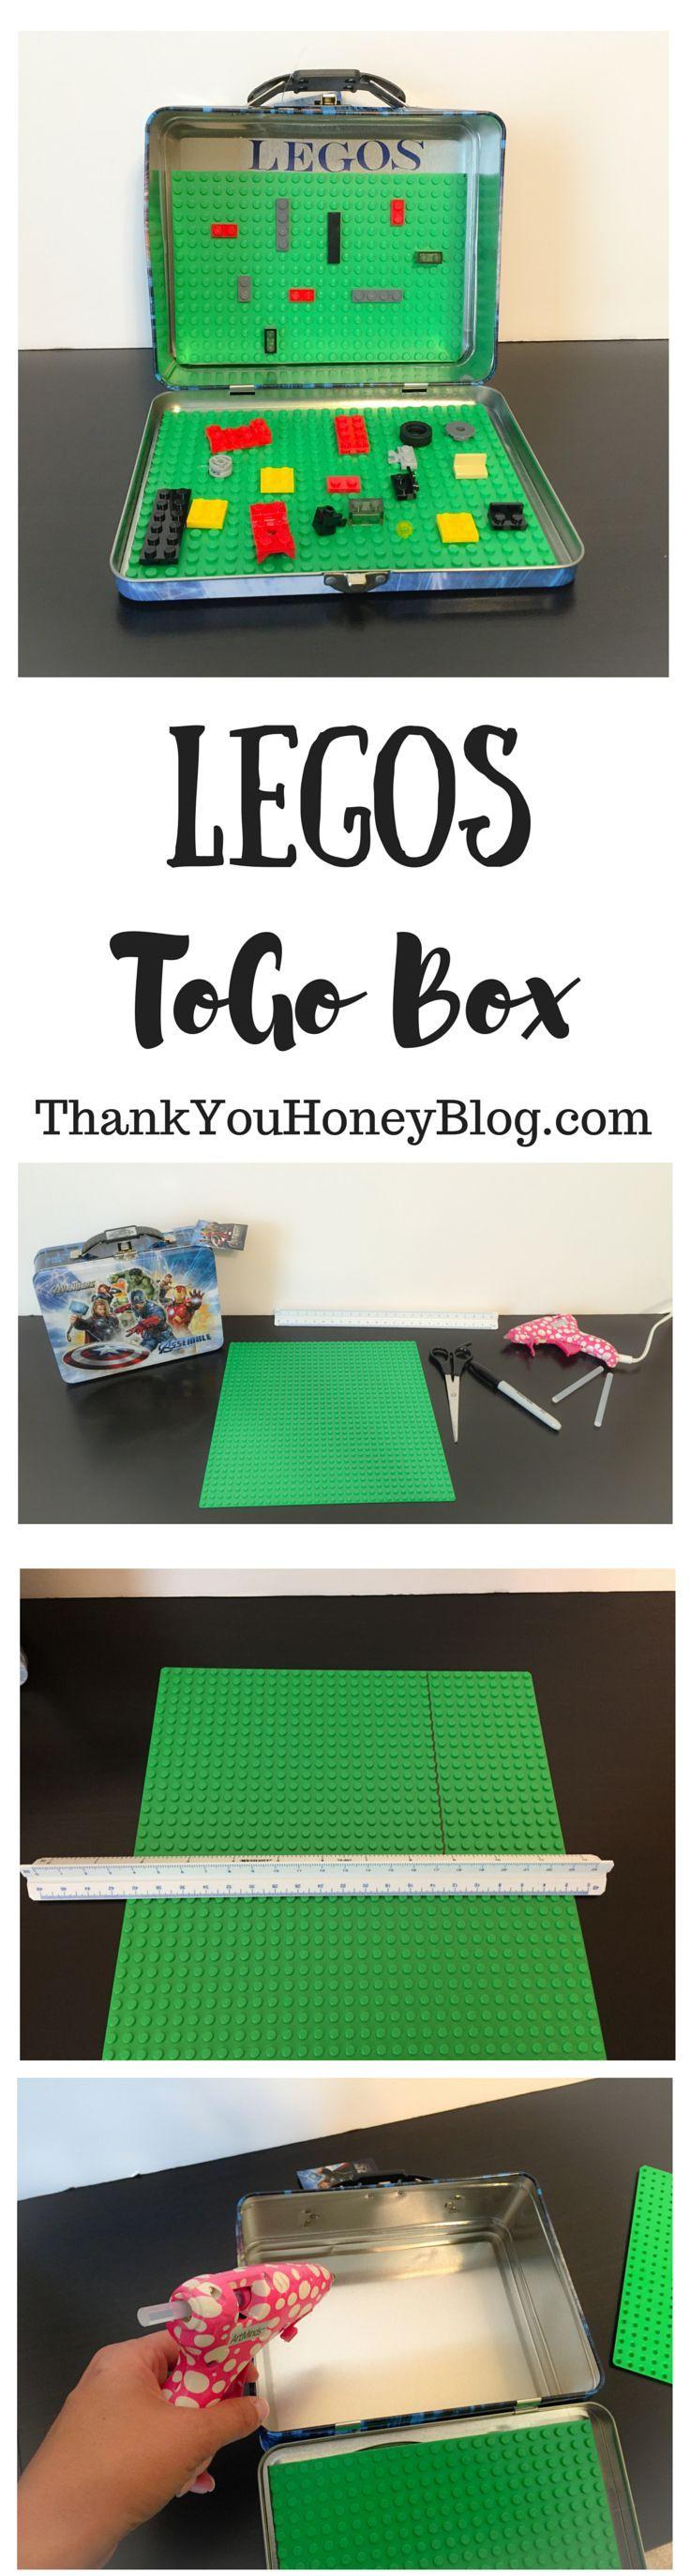 LEGOS ToGo Box, Travel LEGO Box, LEGOS, Travel, Kids, Kids Activities, Travel Activities for Kids, Traveling with kids, Travel Activities, DIY, Tutorial, Vacation, Road Trips, Plane, http://thankyouhoneyblog.com